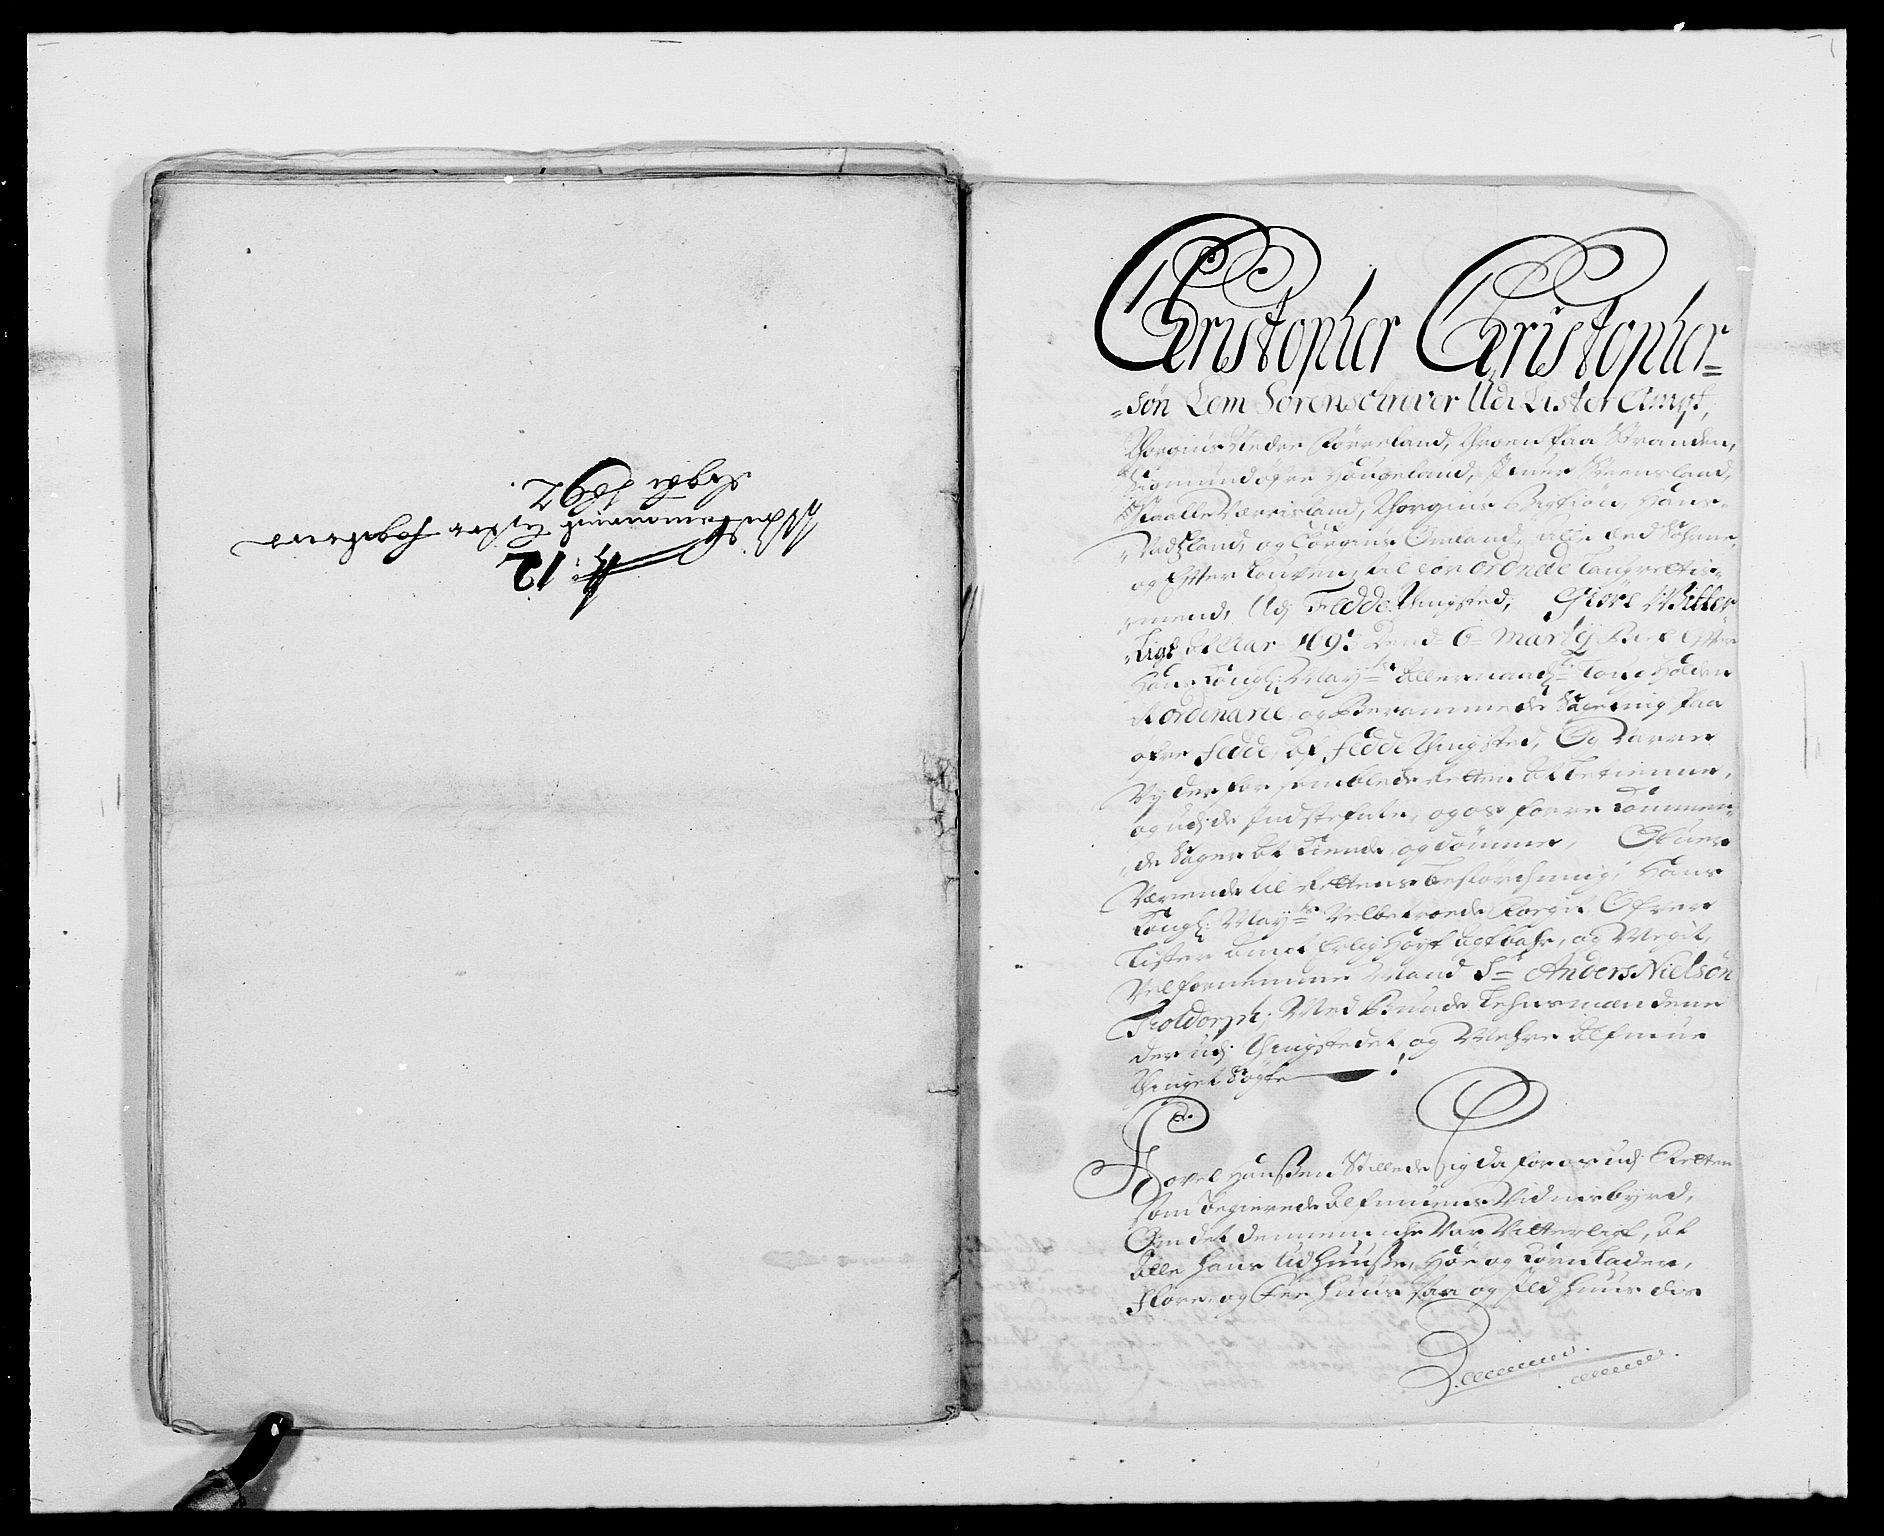 RA, Rentekammeret inntil 1814, Reviderte regnskaper, Fogderegnskap, R41/L2536: Fogderegnskap Lista, 1690-1693, s. 271